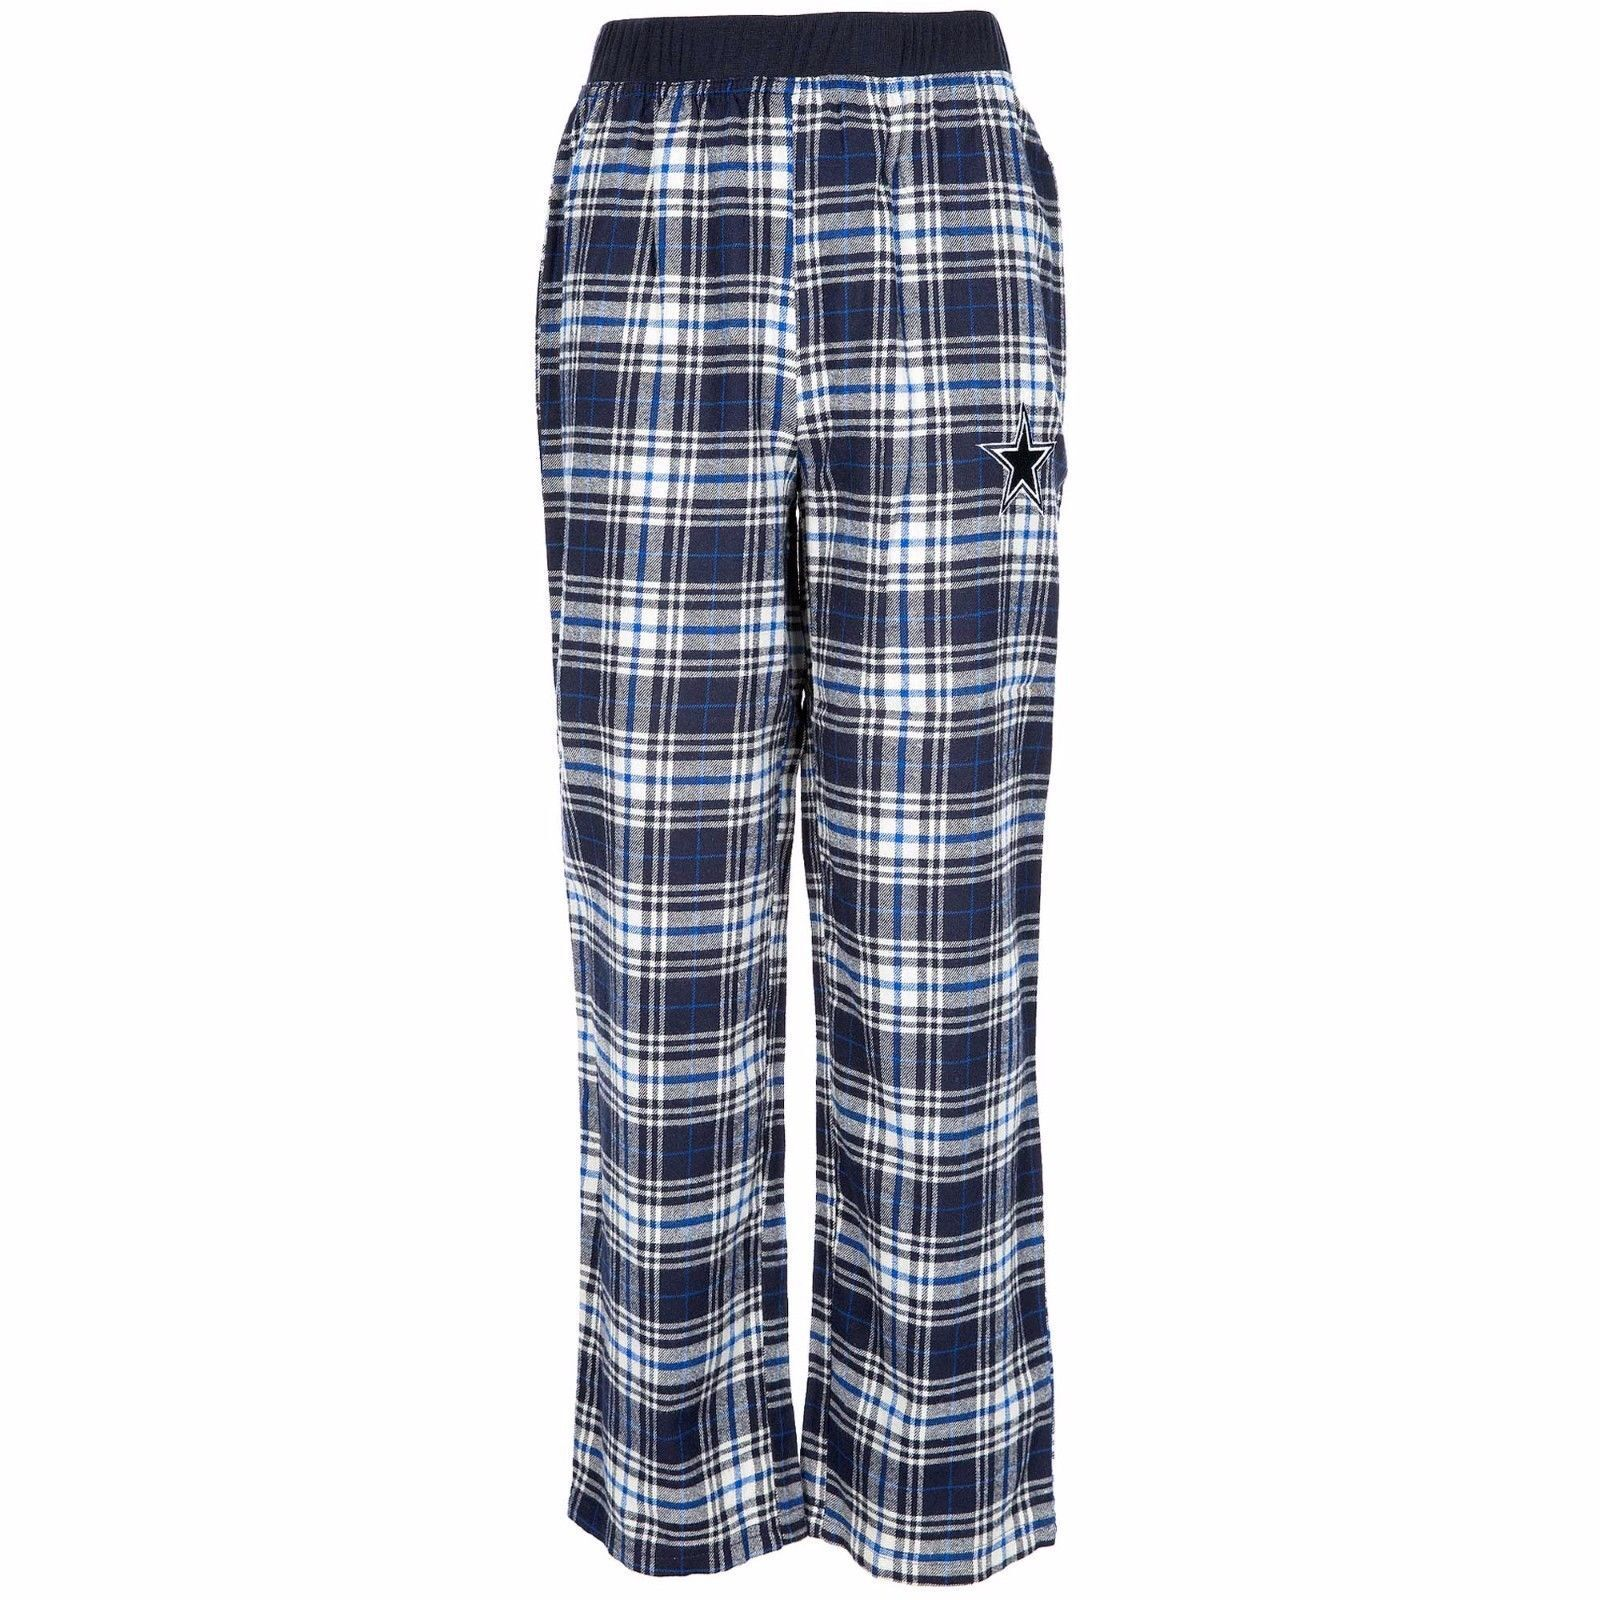 Dallas Cowboys Youth Plaid Flannel Pajama Sleep Pants - Slee